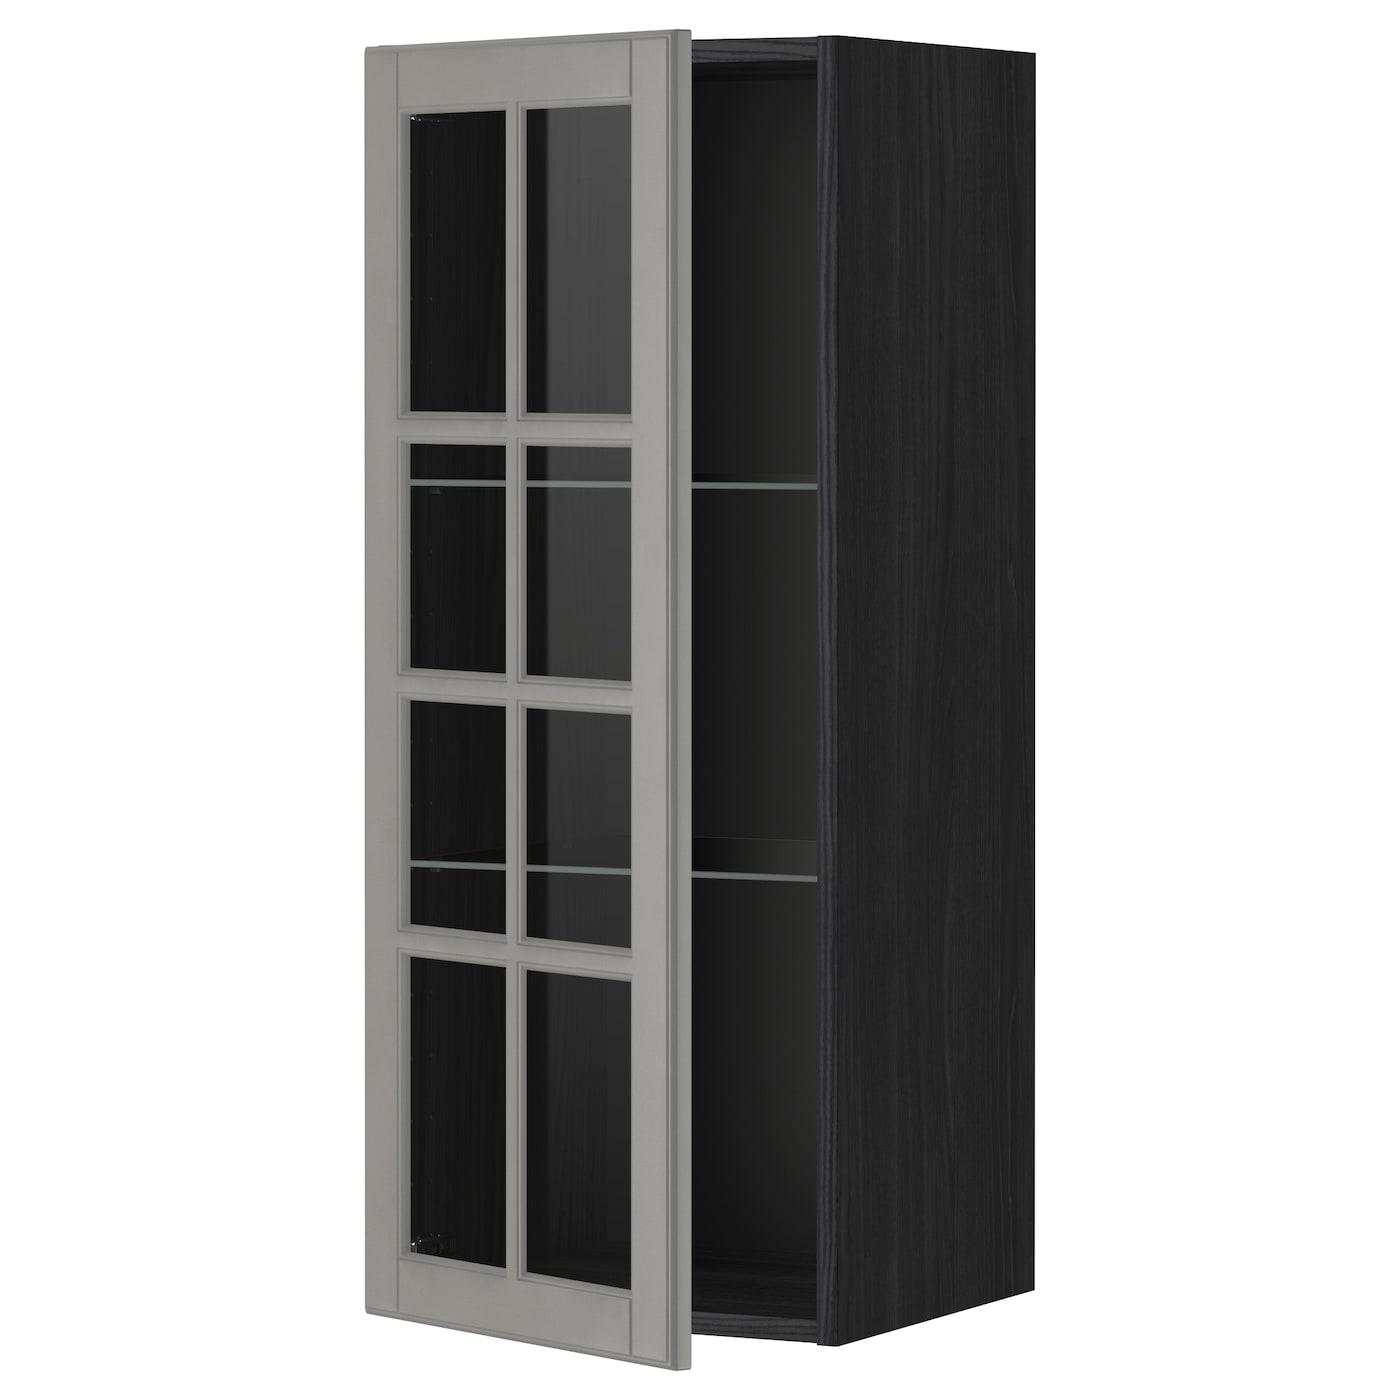 Ikea Kitchen Glass Cabinets: METOD Wall Cabinet W Shelves/glass Door Black/bodbyn Grey